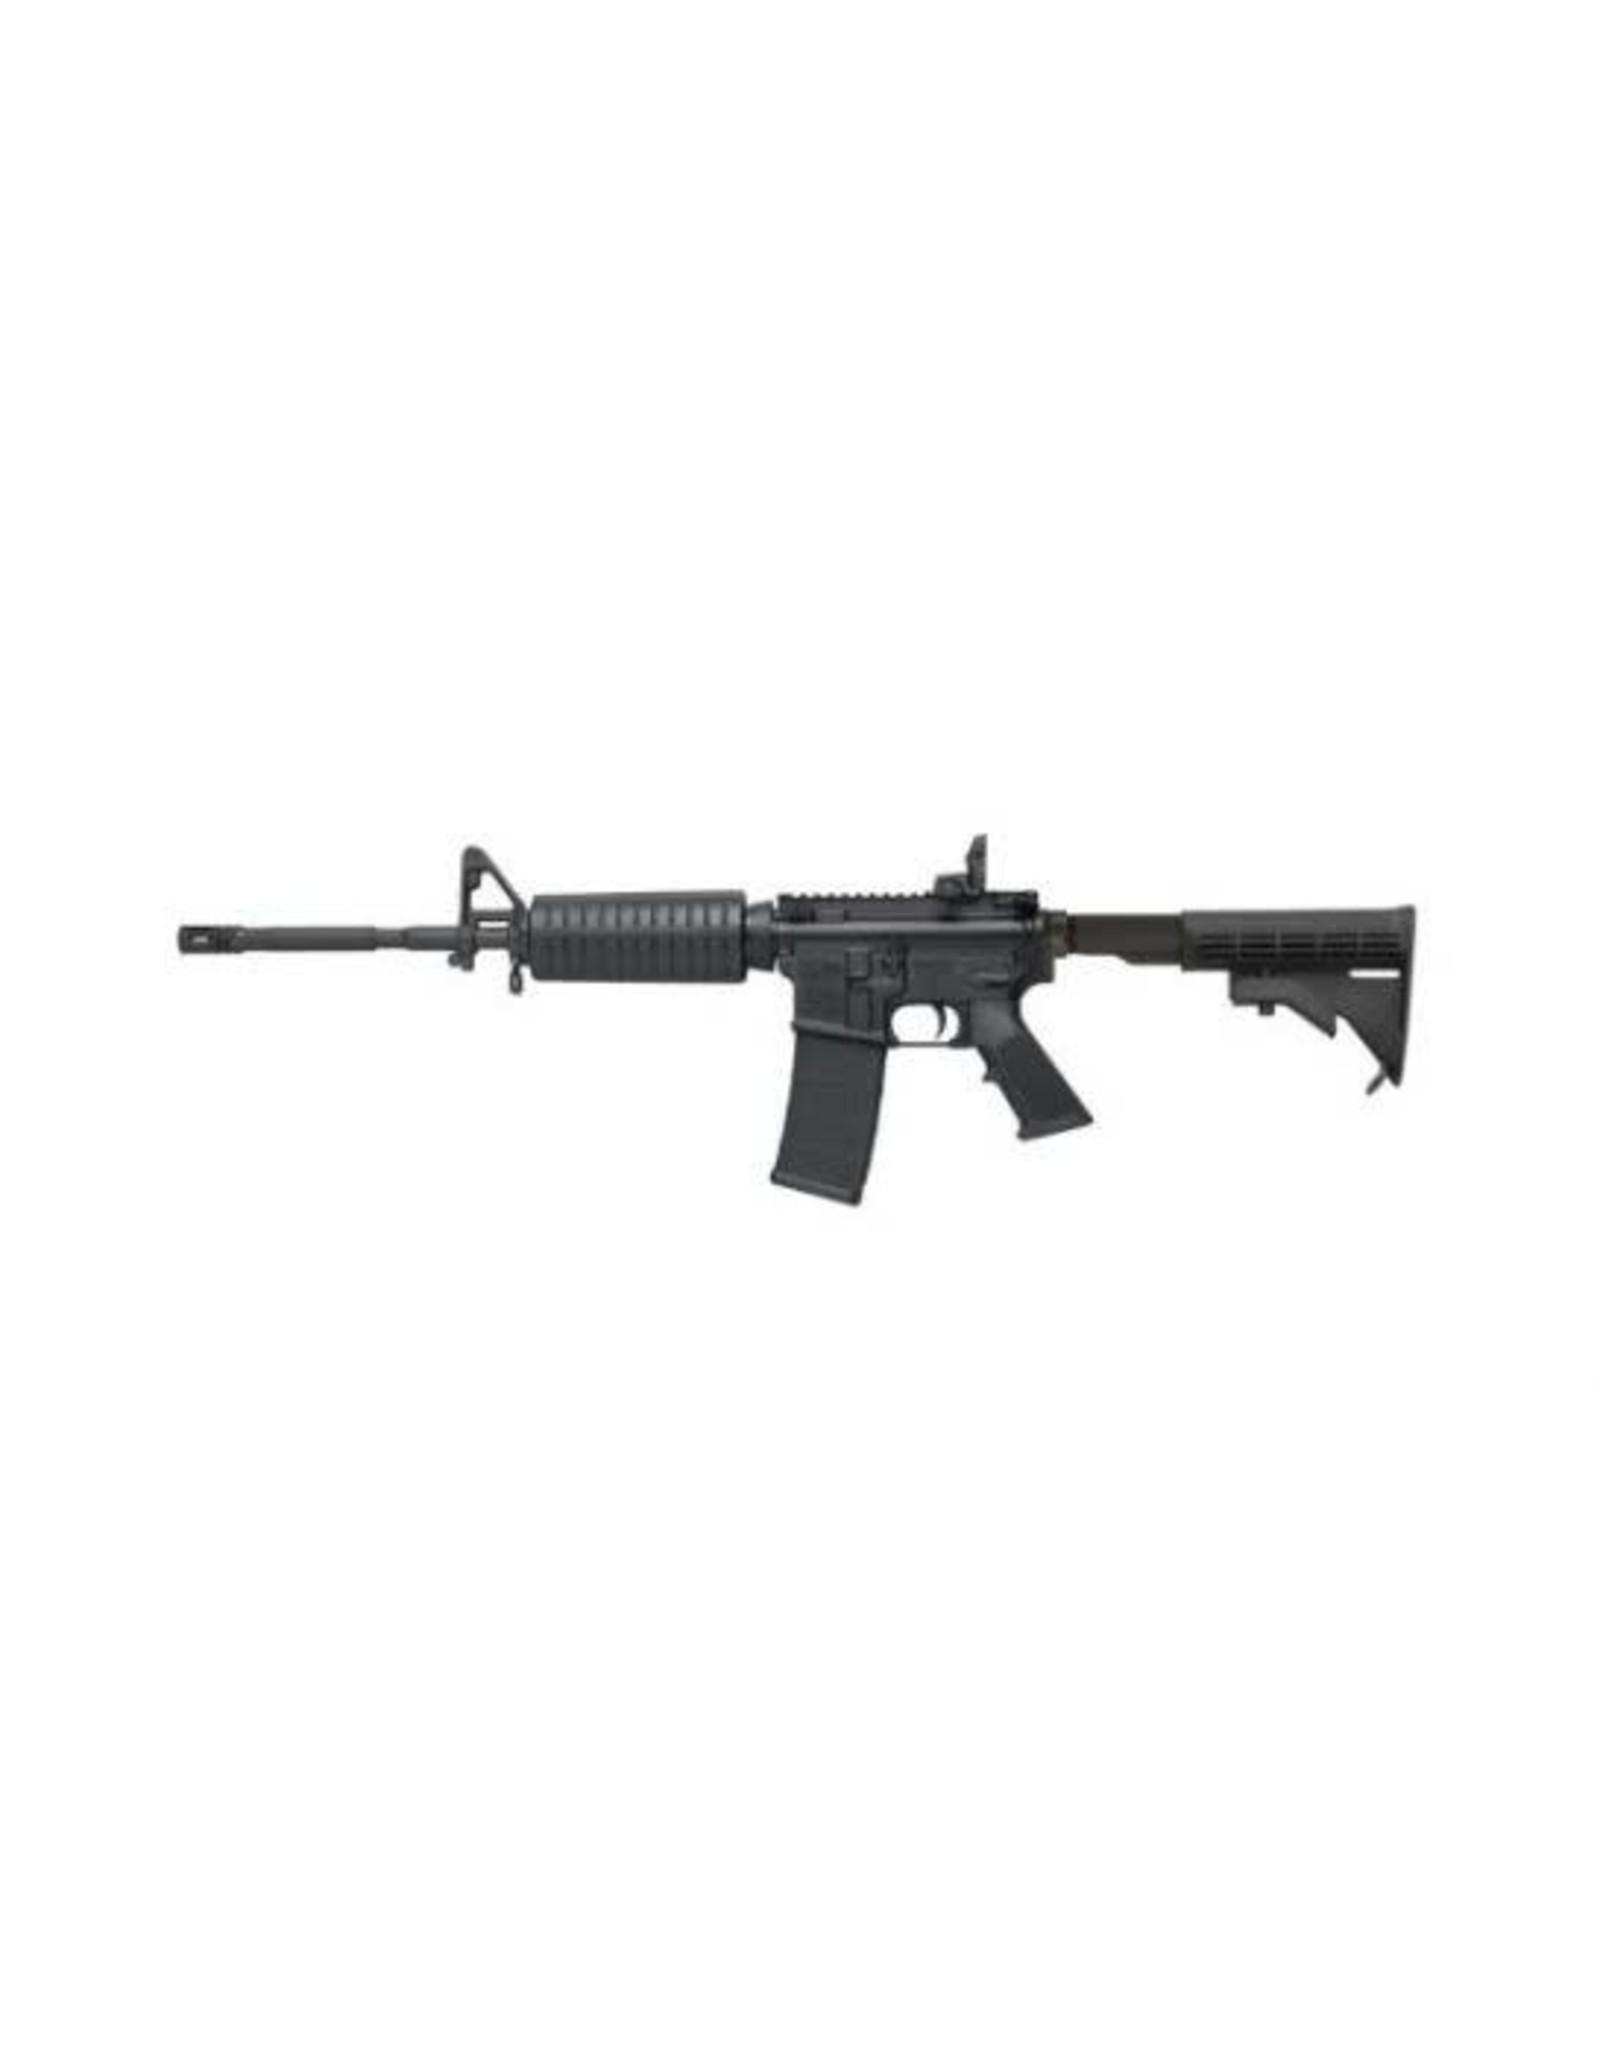 "Colt M4 Carbine 5.56/.223 16"" bbl 30+1 Round"